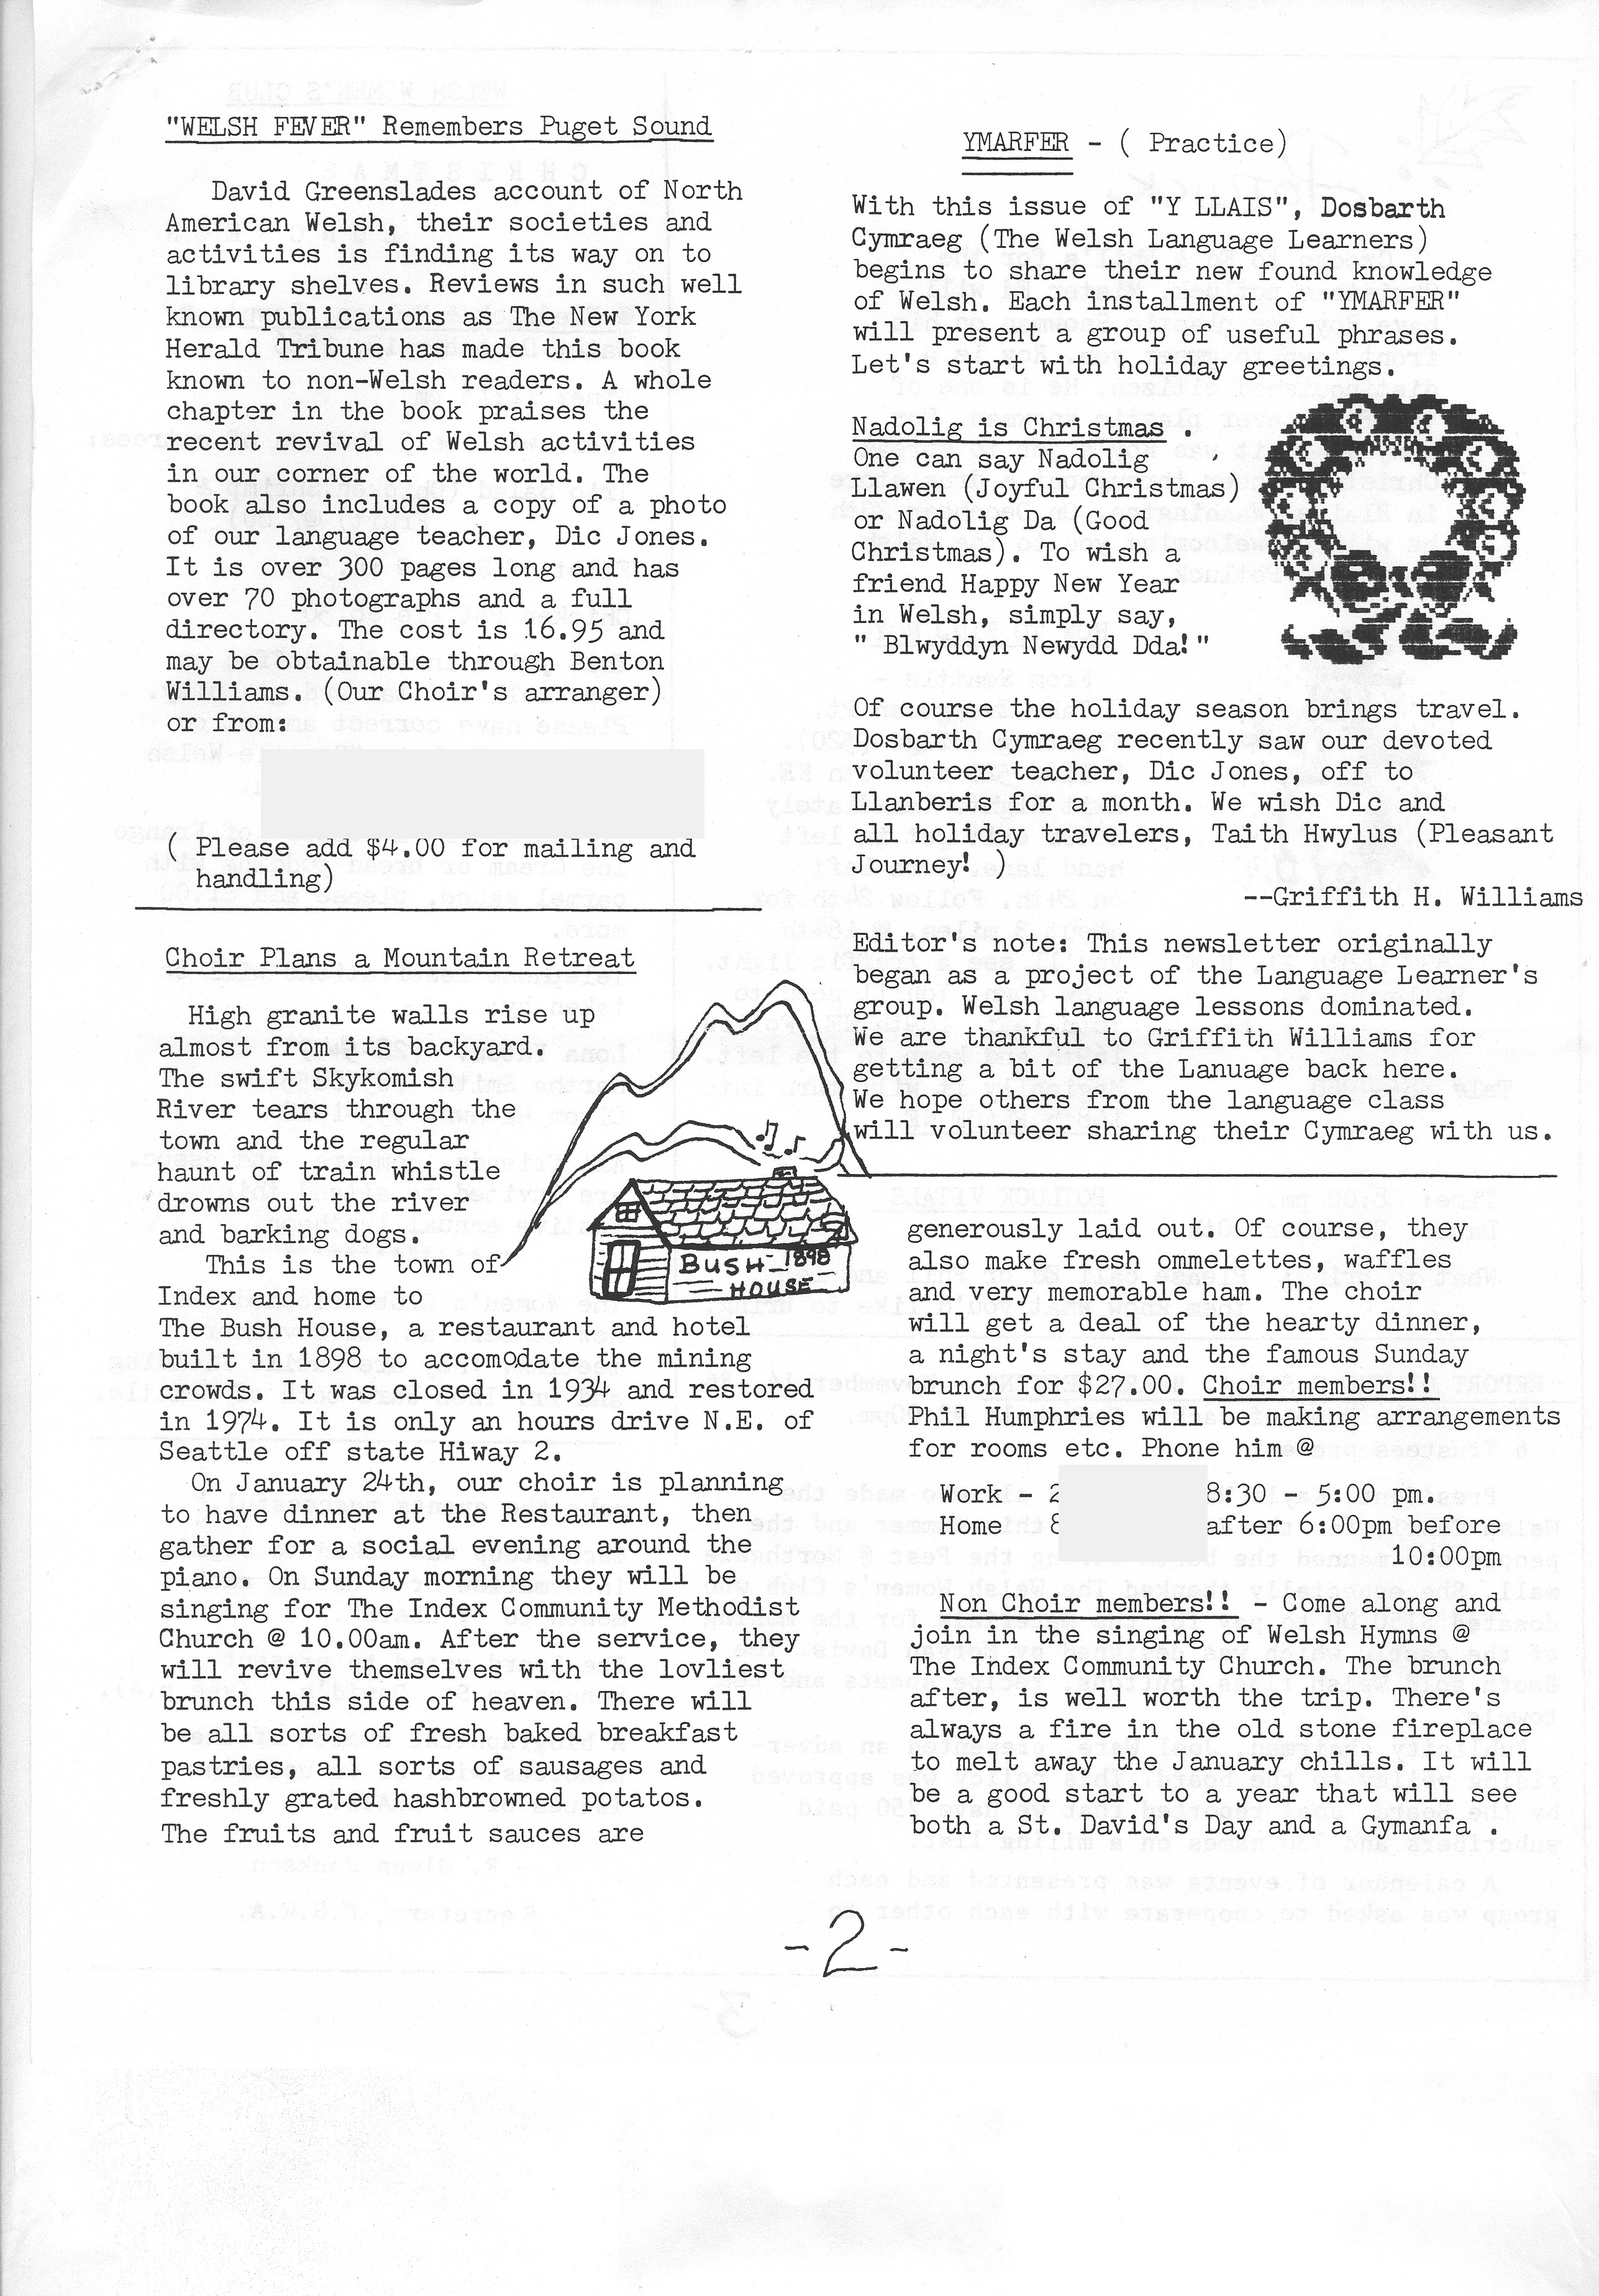 Y Llais Society Newsletter Puget Sound Welsh Association Seattle